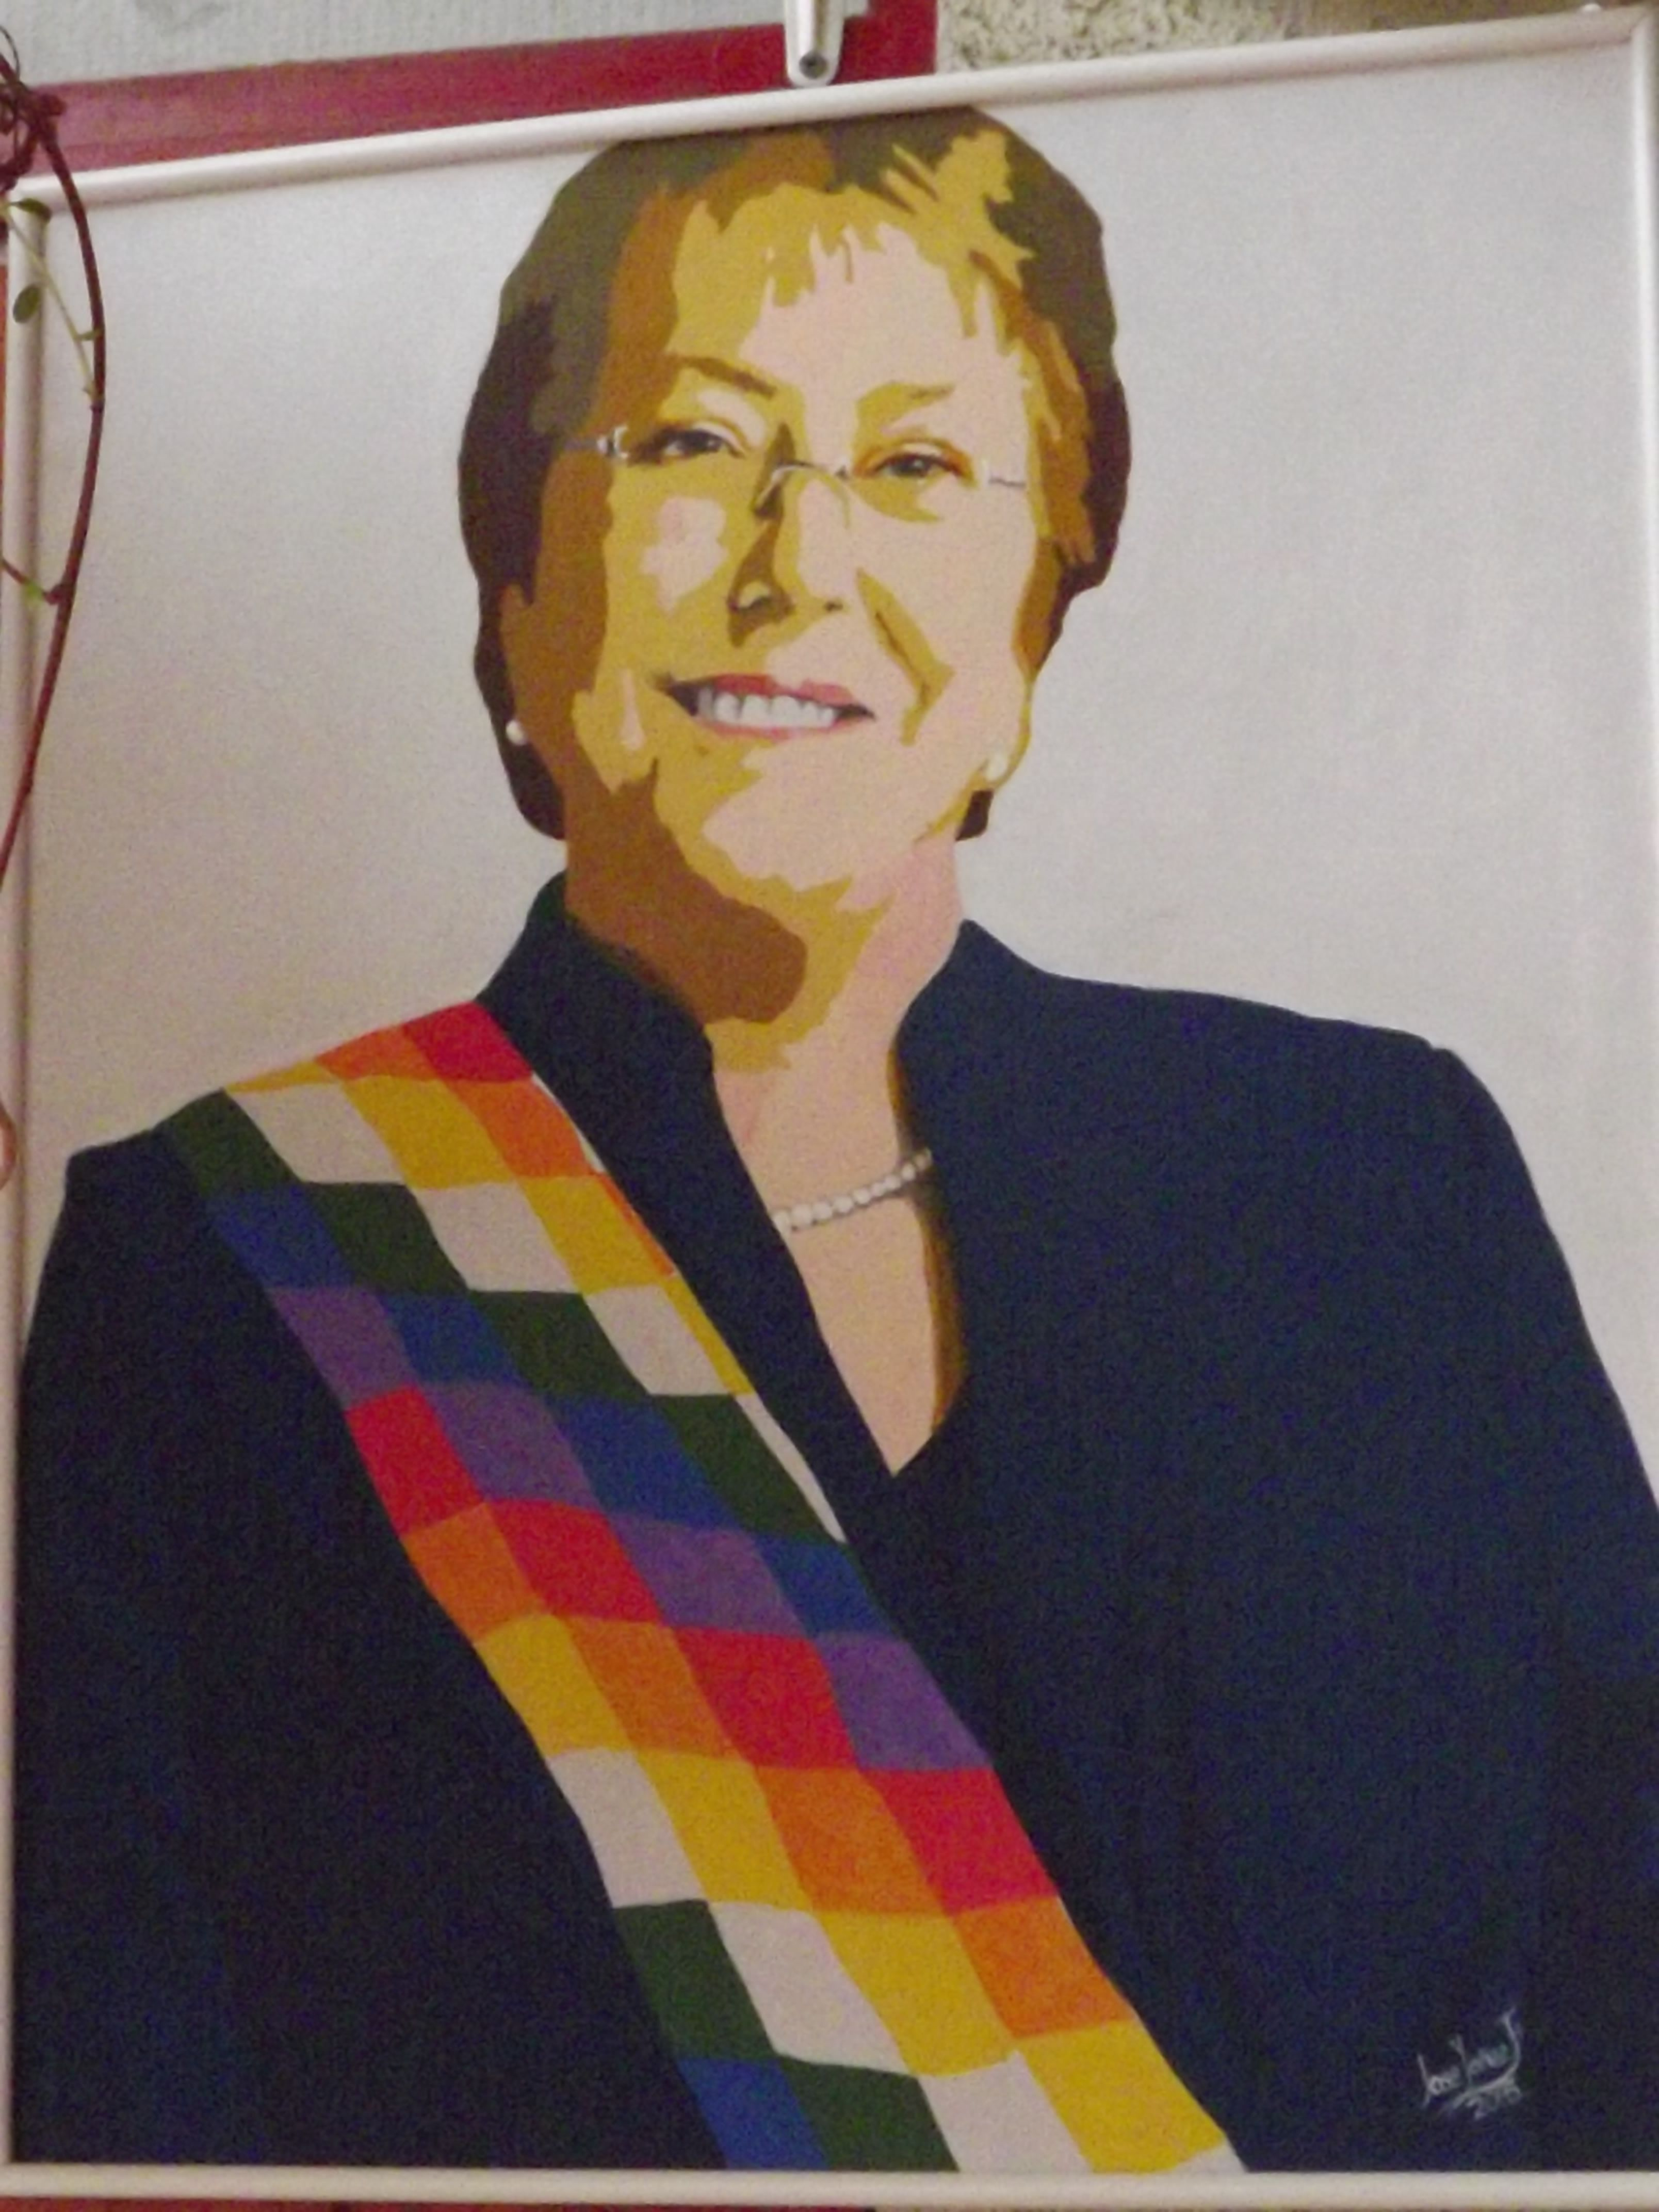 retrato pop art de la presidenta de chile, michelle bachelet